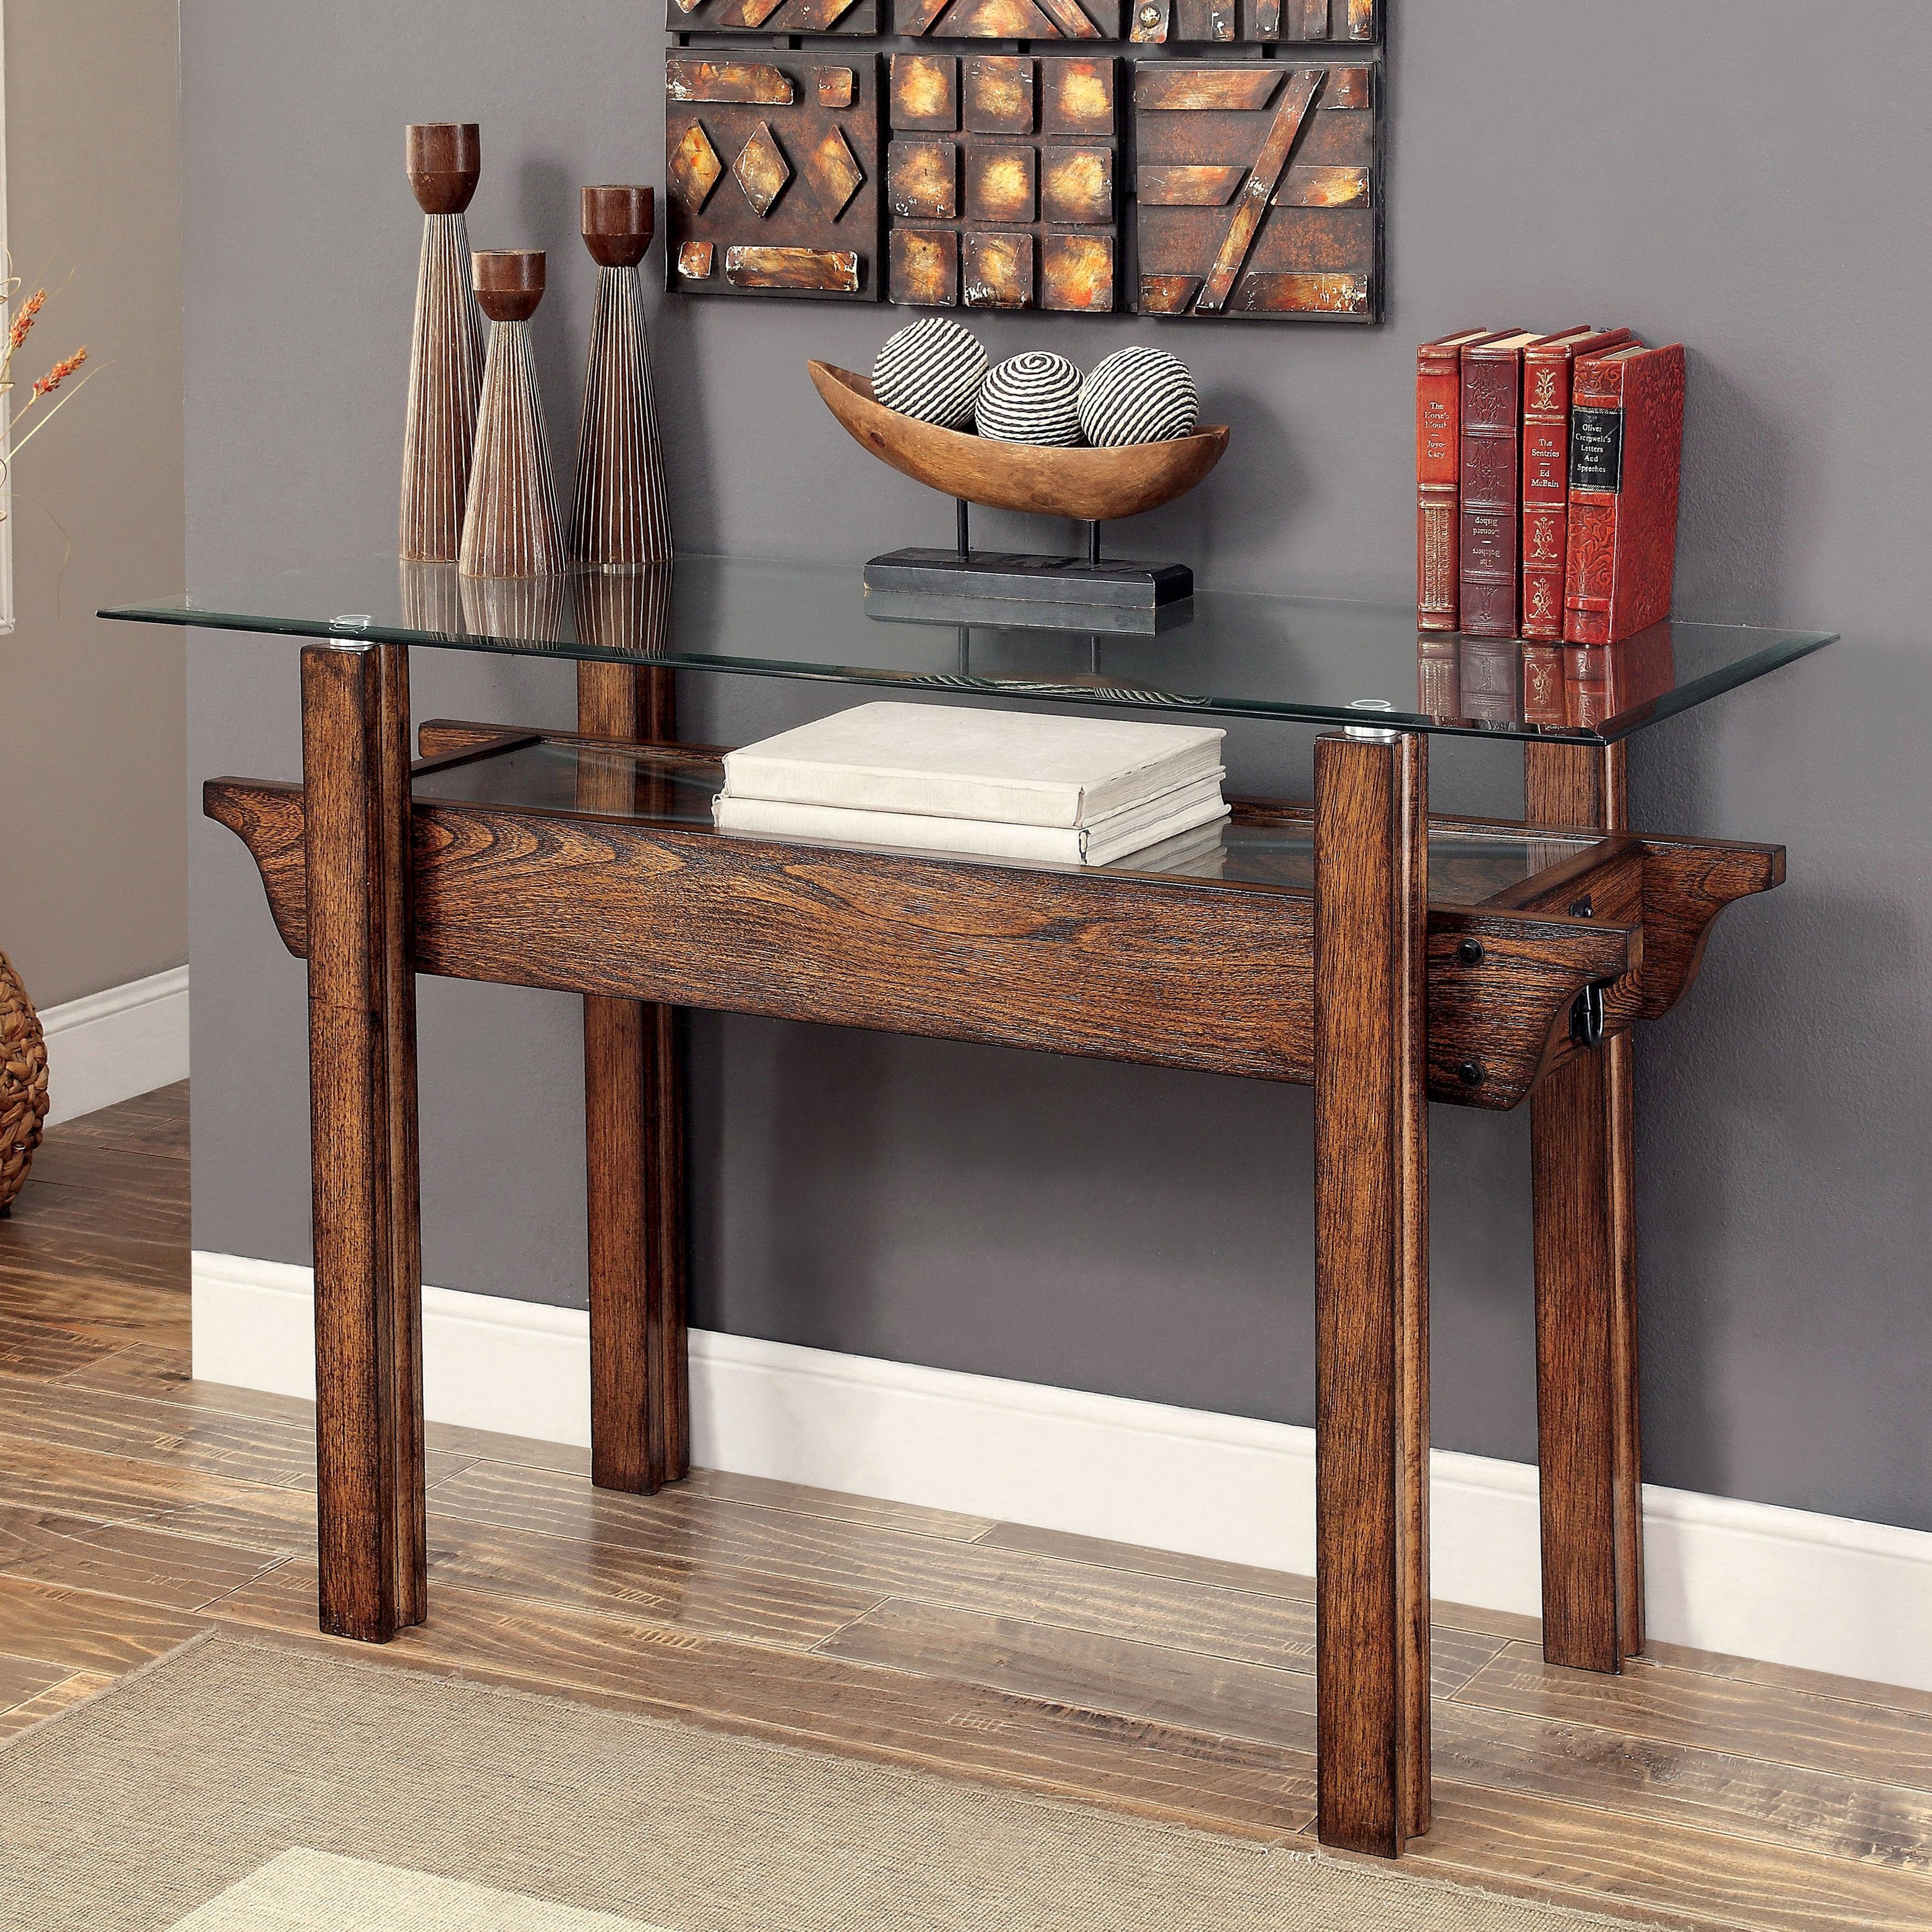 Shop Furniture Of America Charlotte Weathered Oak Glass Top Sofa